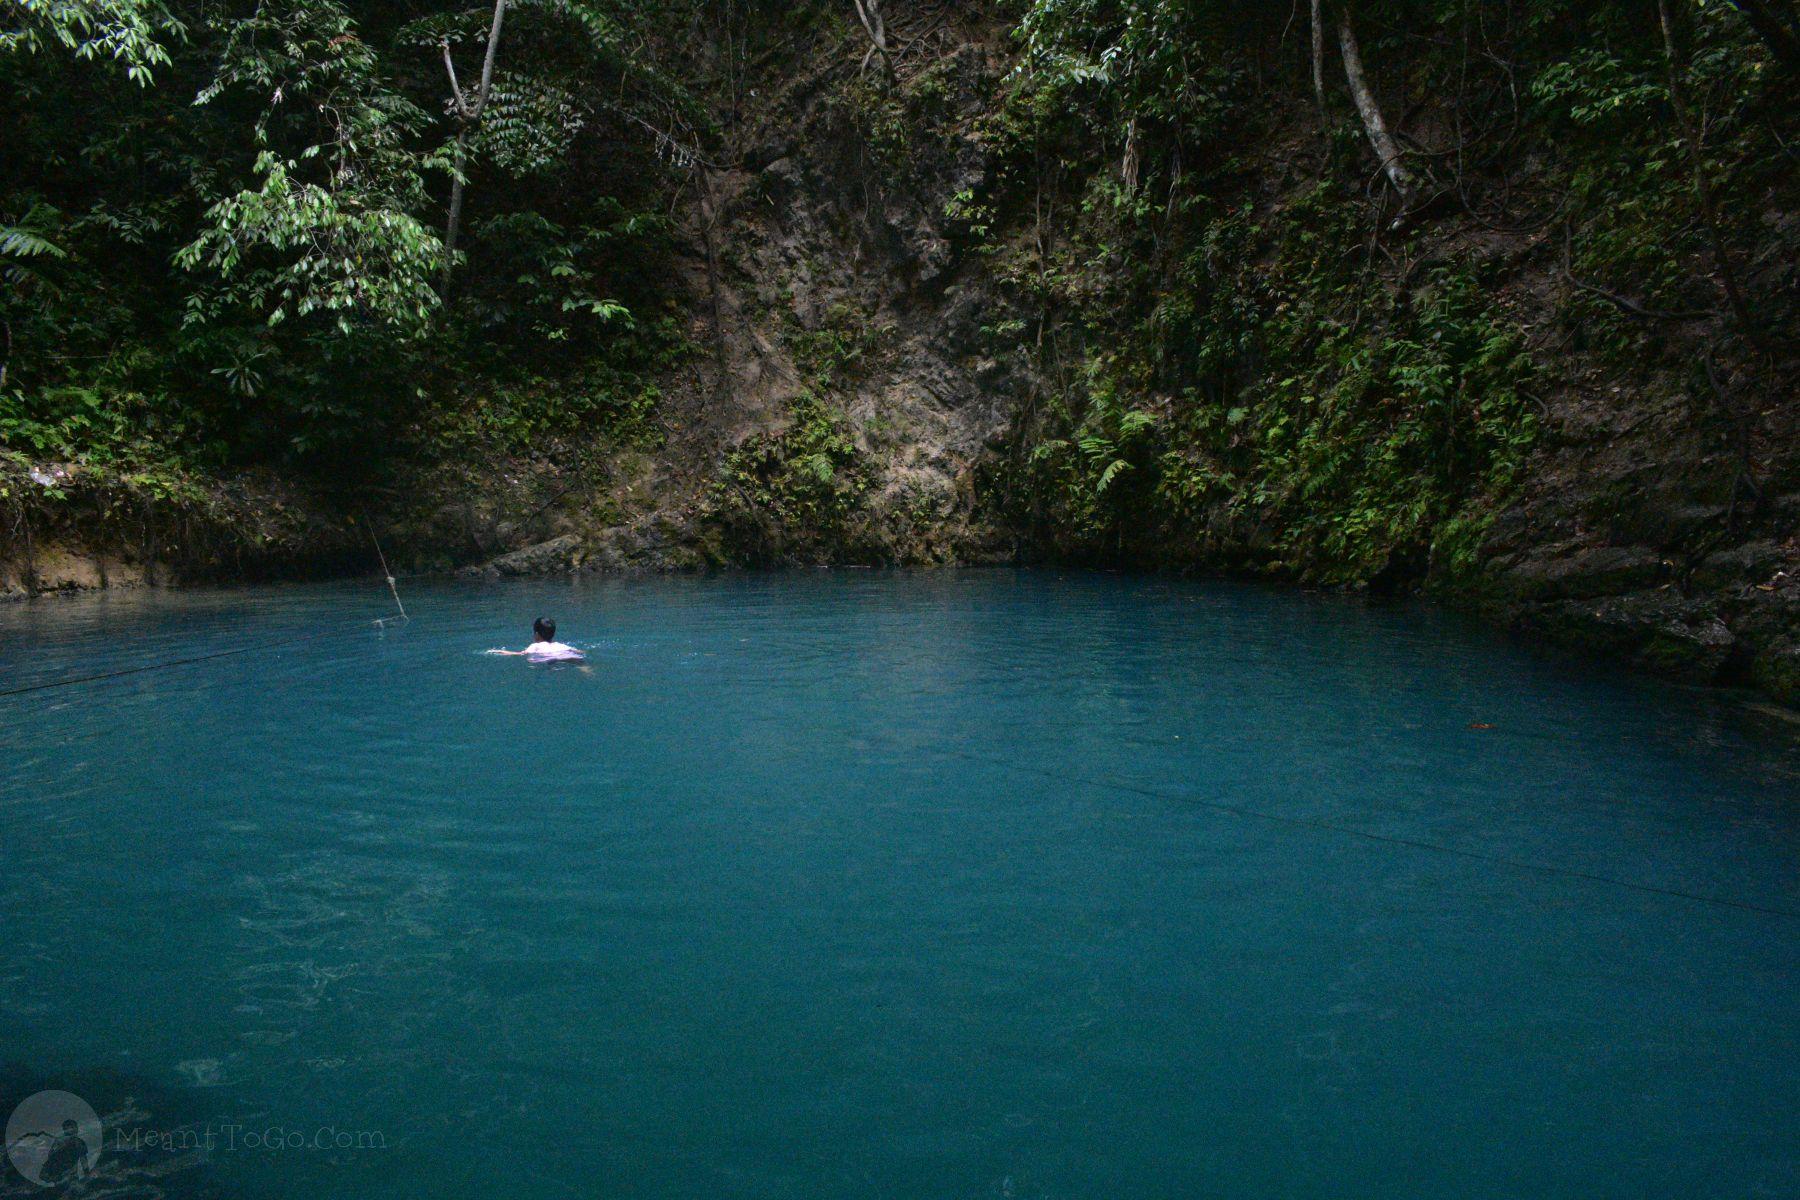 Canawa Cold Spring, Candijay, Bohol, Philippines